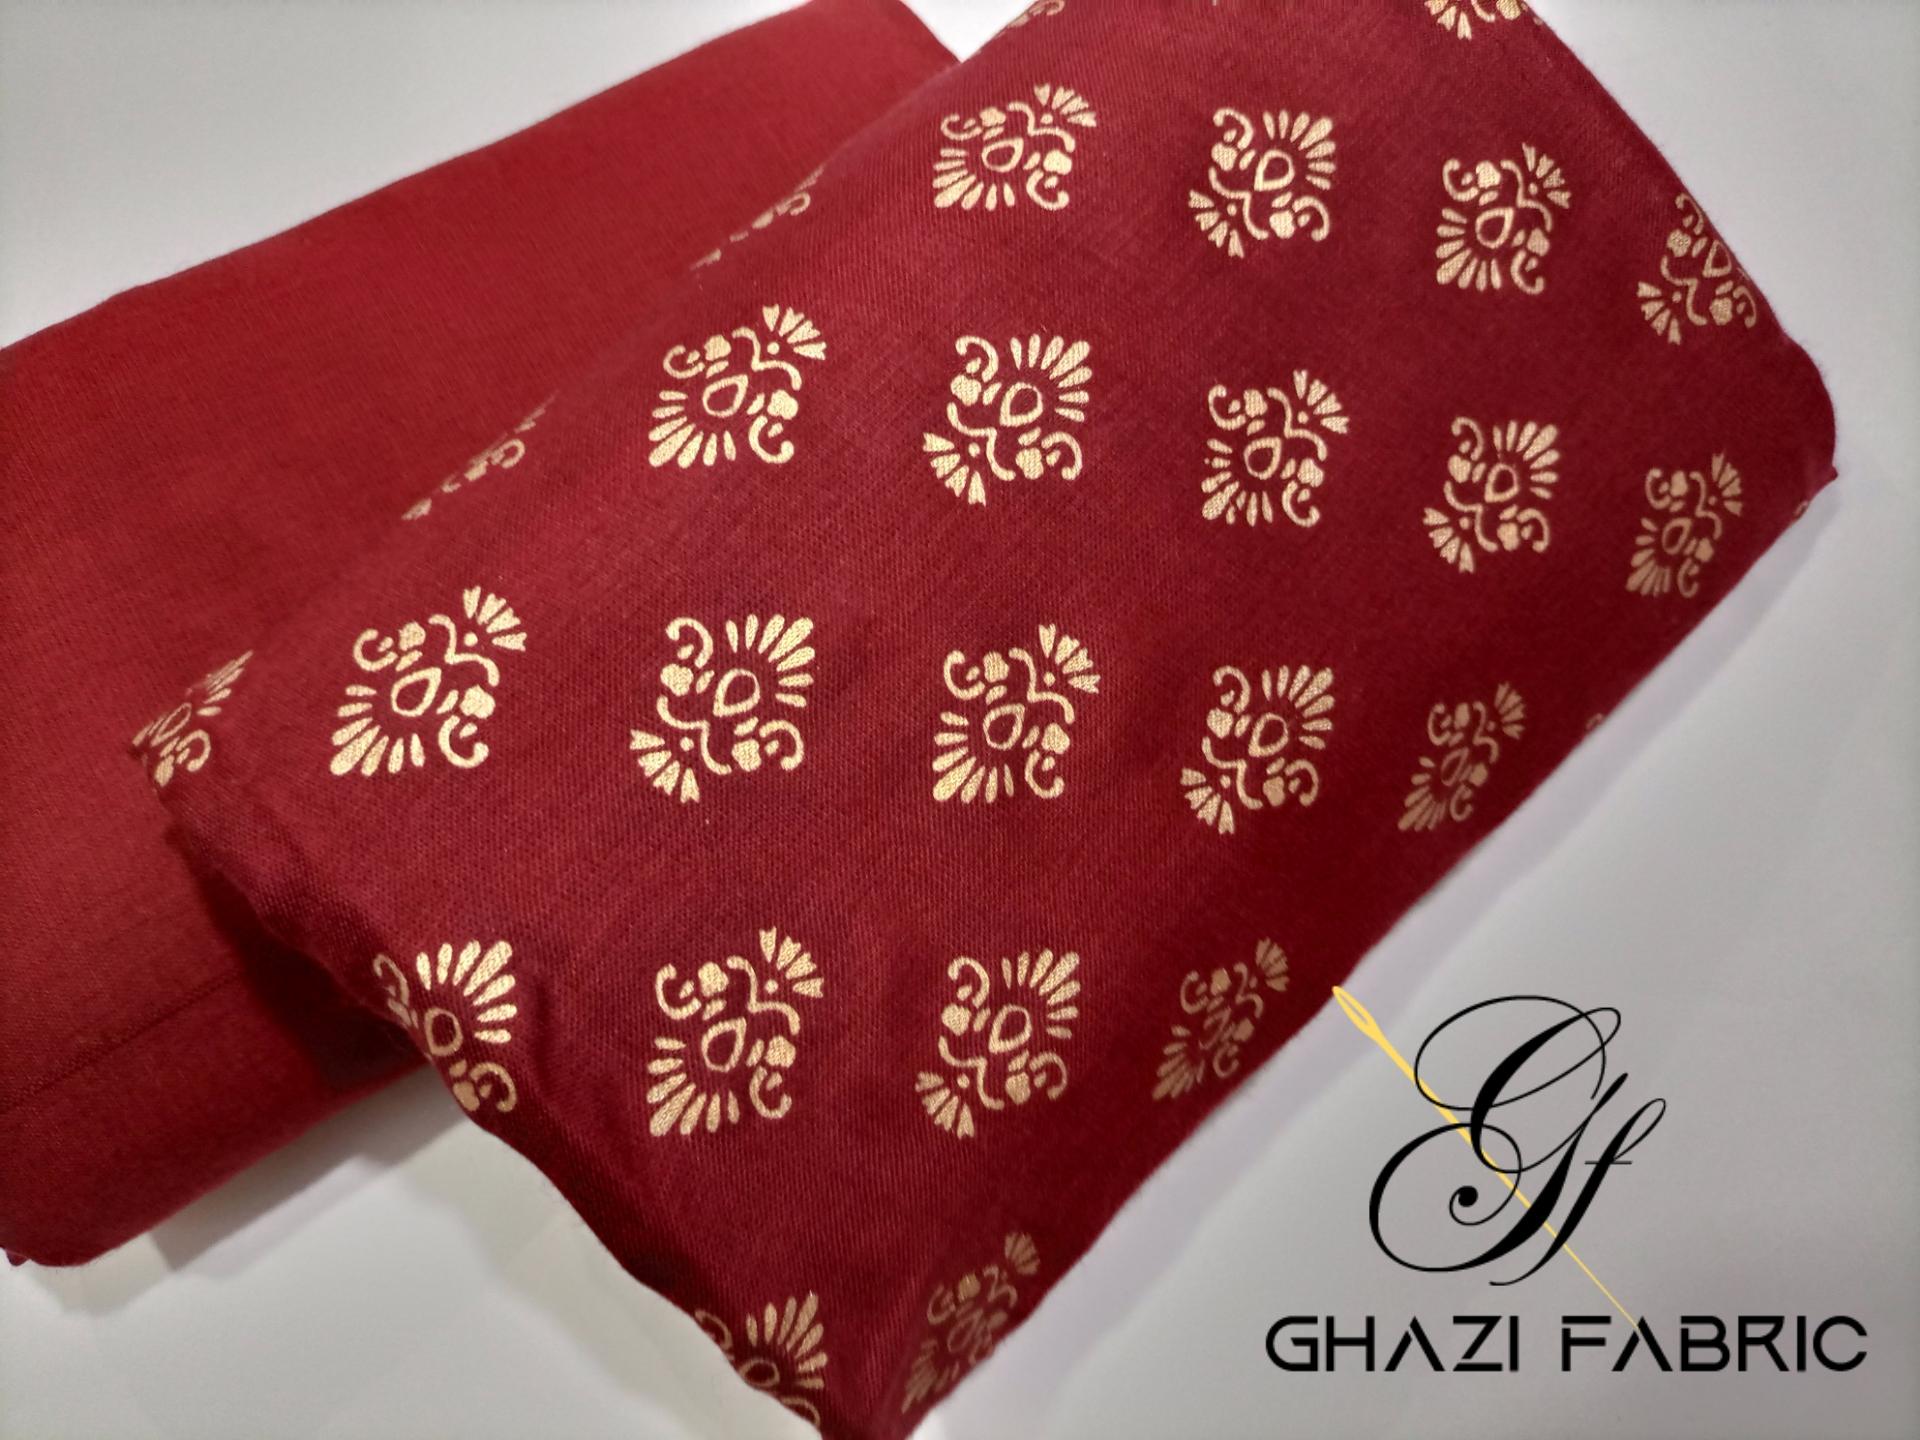 Ghazi fabric Premium quality unstich linen collection  2pc 5/yards mahroon (gf16m)